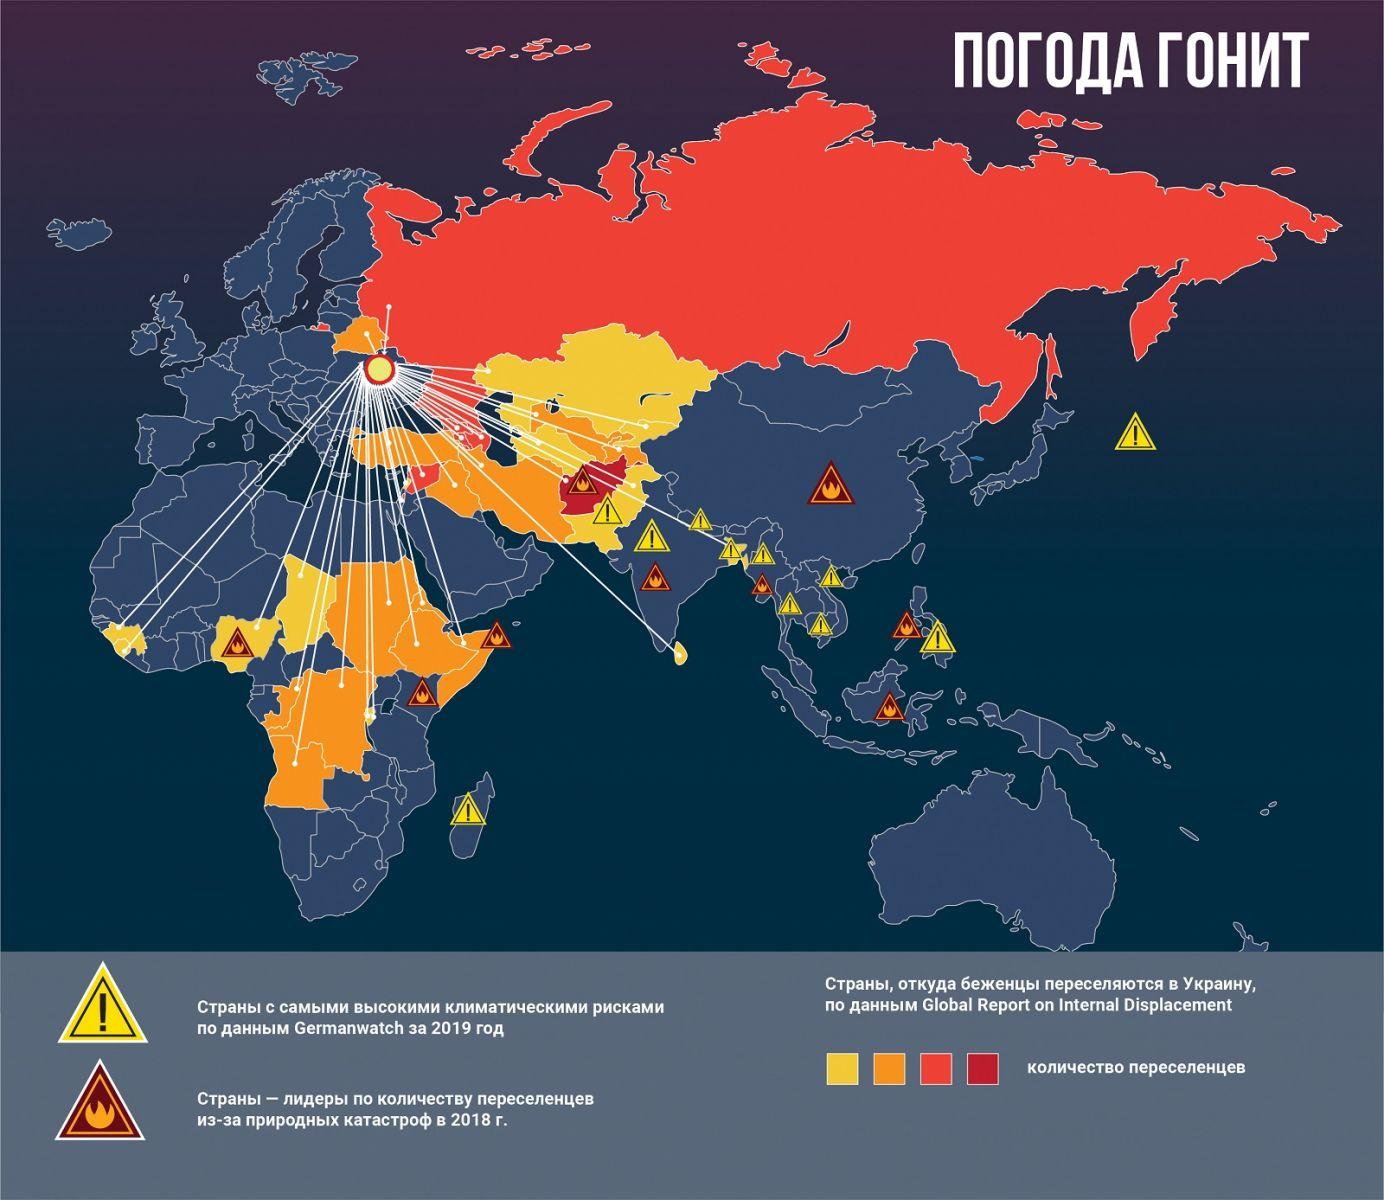 переселенцы, беженцы, климатические беженцы, карта, беженцы в Украину, климатические риски